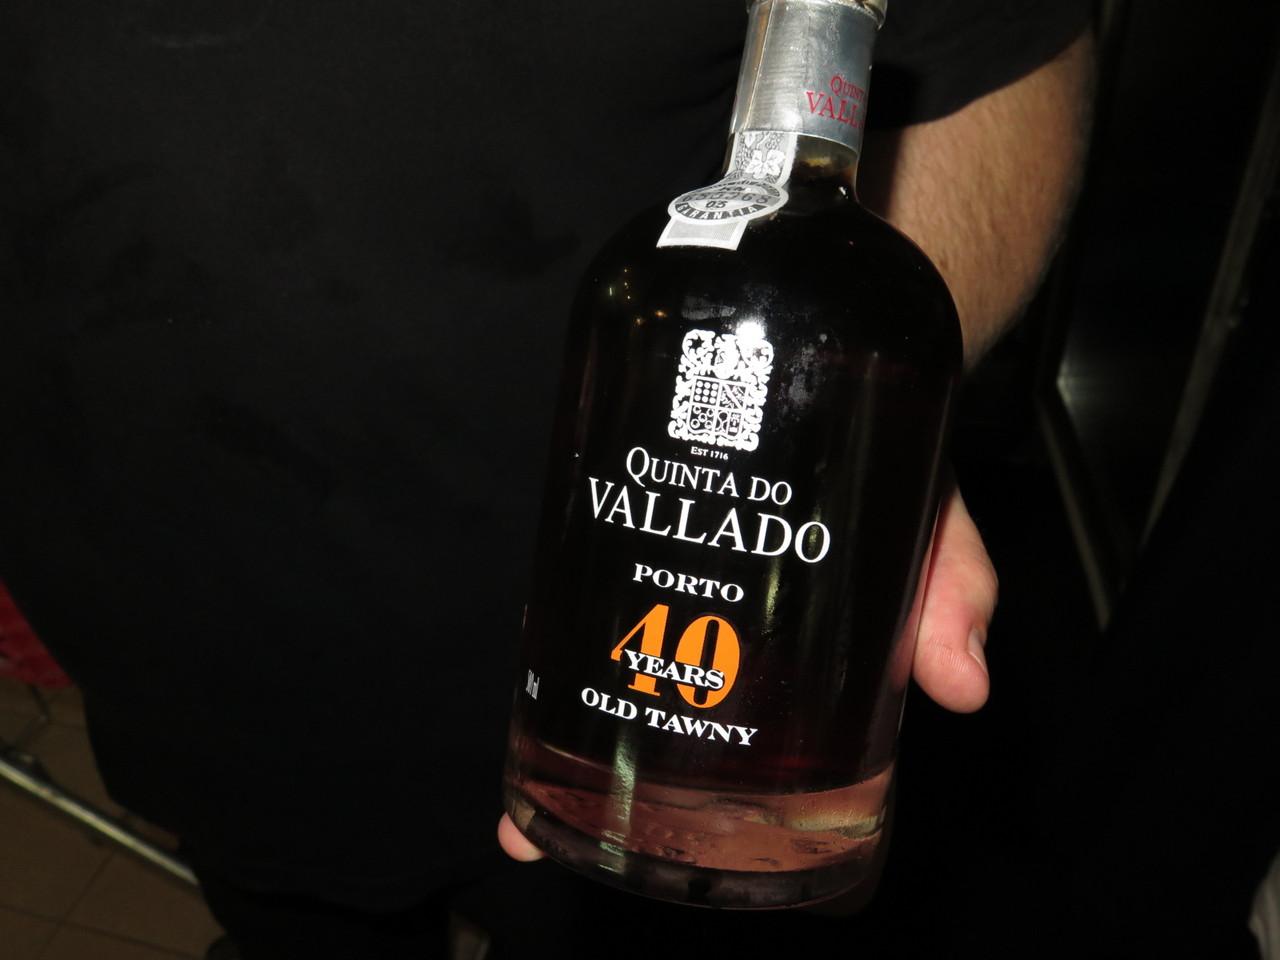 Quinta do Vallado 40 Years Old Tawny